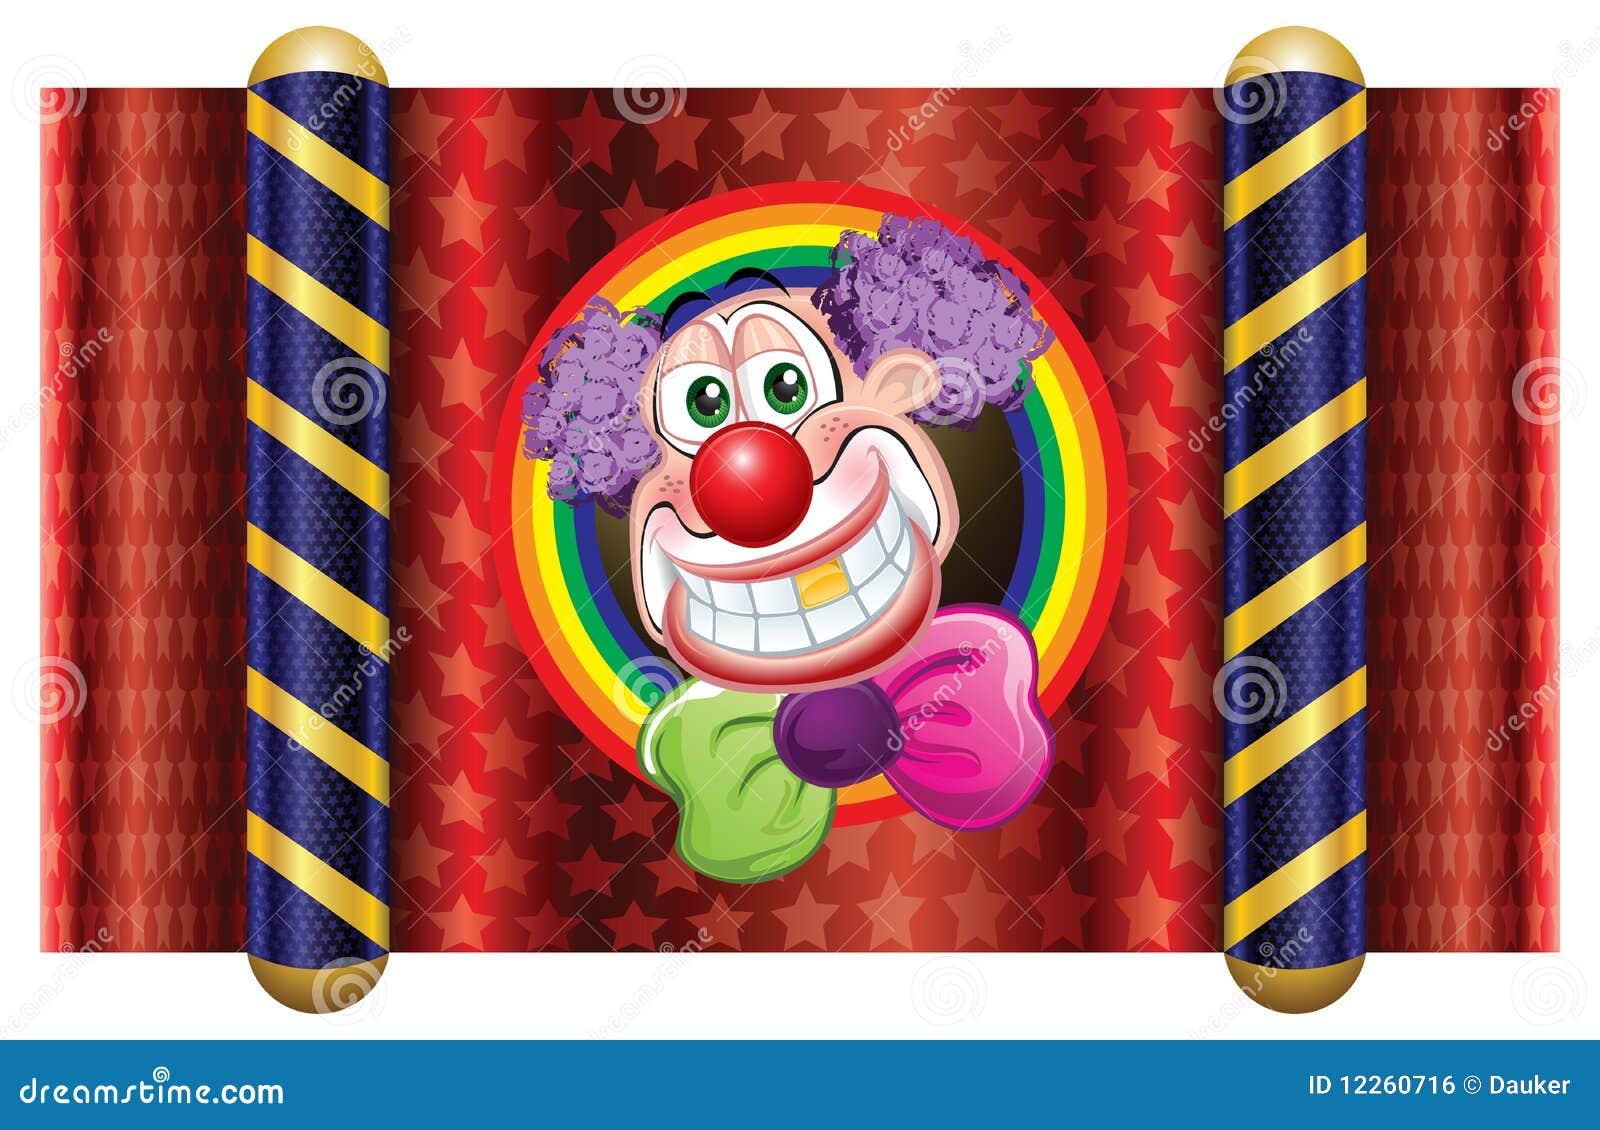 The Clowns' Plan